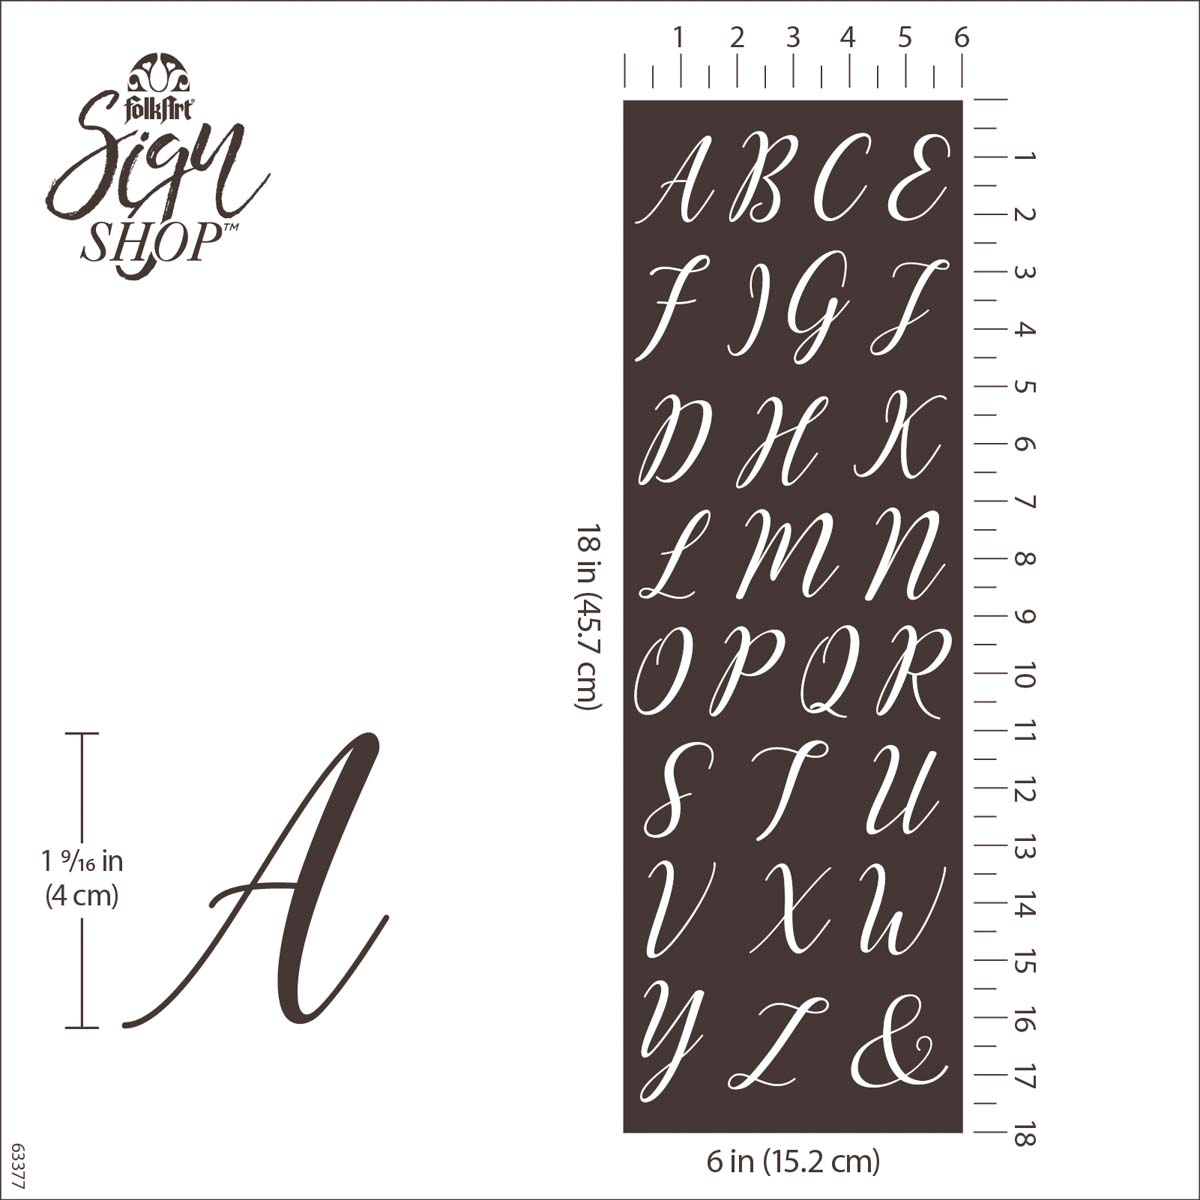 FolkArt ® Sign Shop™ Mesh Stencil - Script Letters - 63377